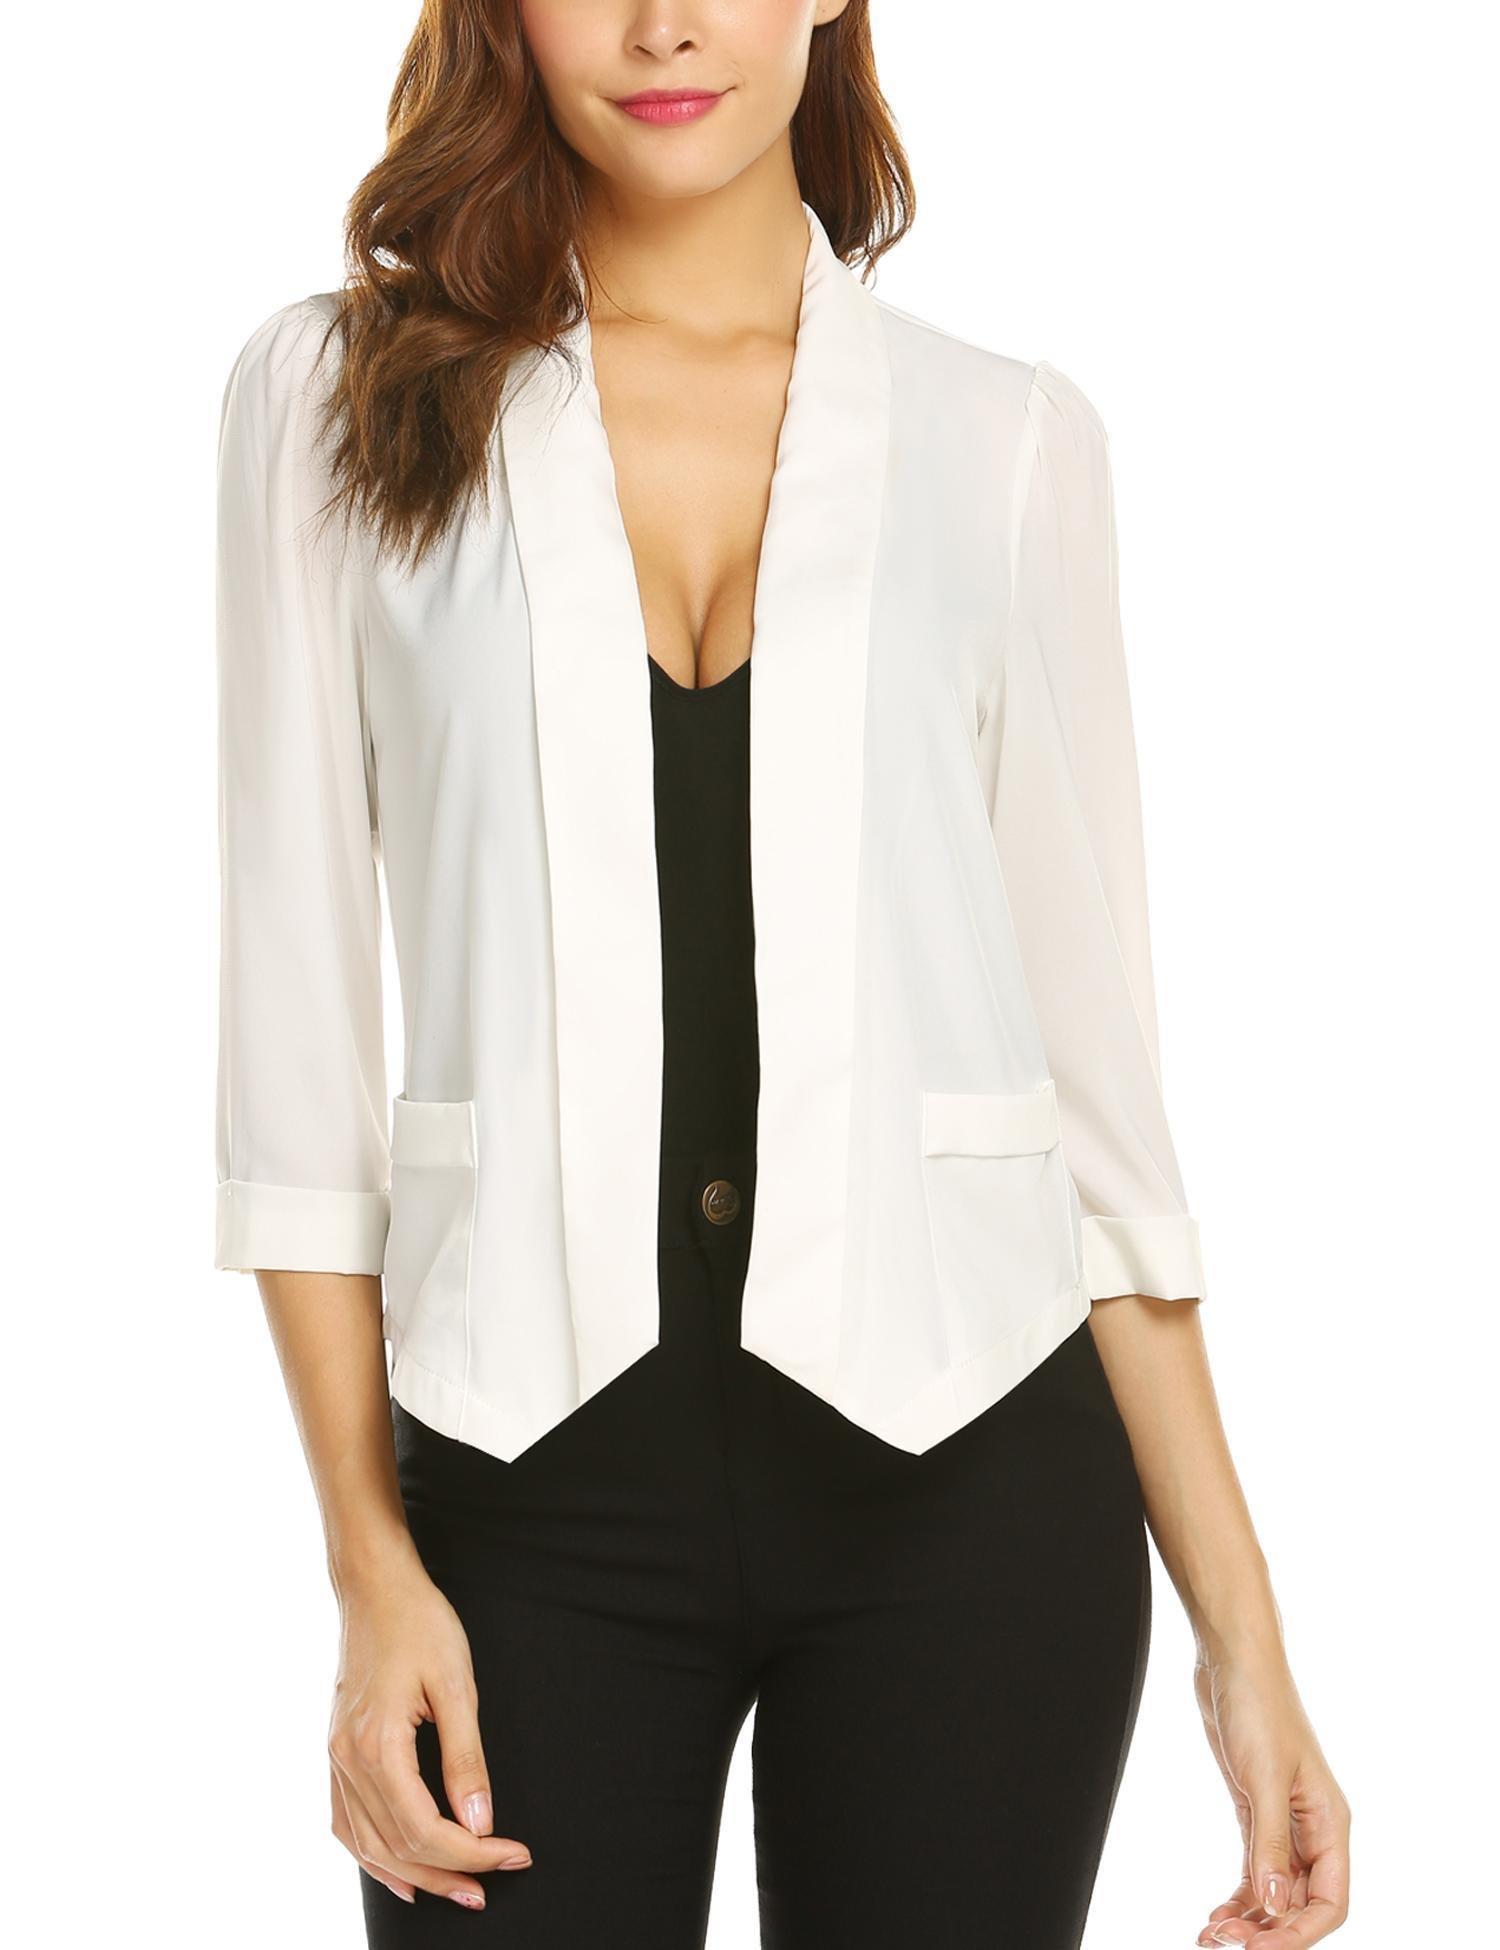 ADOSOUL ealwell Women Office Lightweight Thin Chiffon 3/4 Sleeve Open Front Blazer